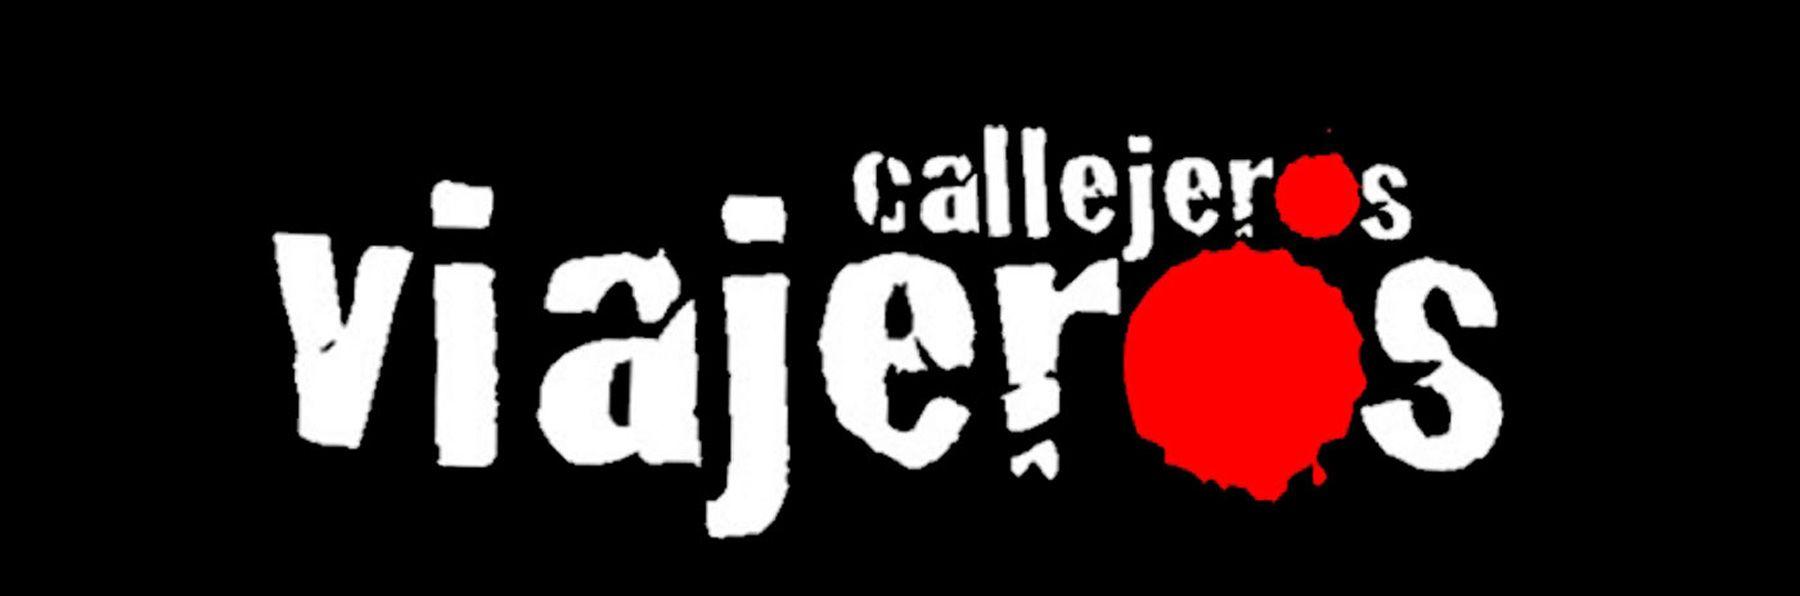 Callejeros Viajeros - Mitele